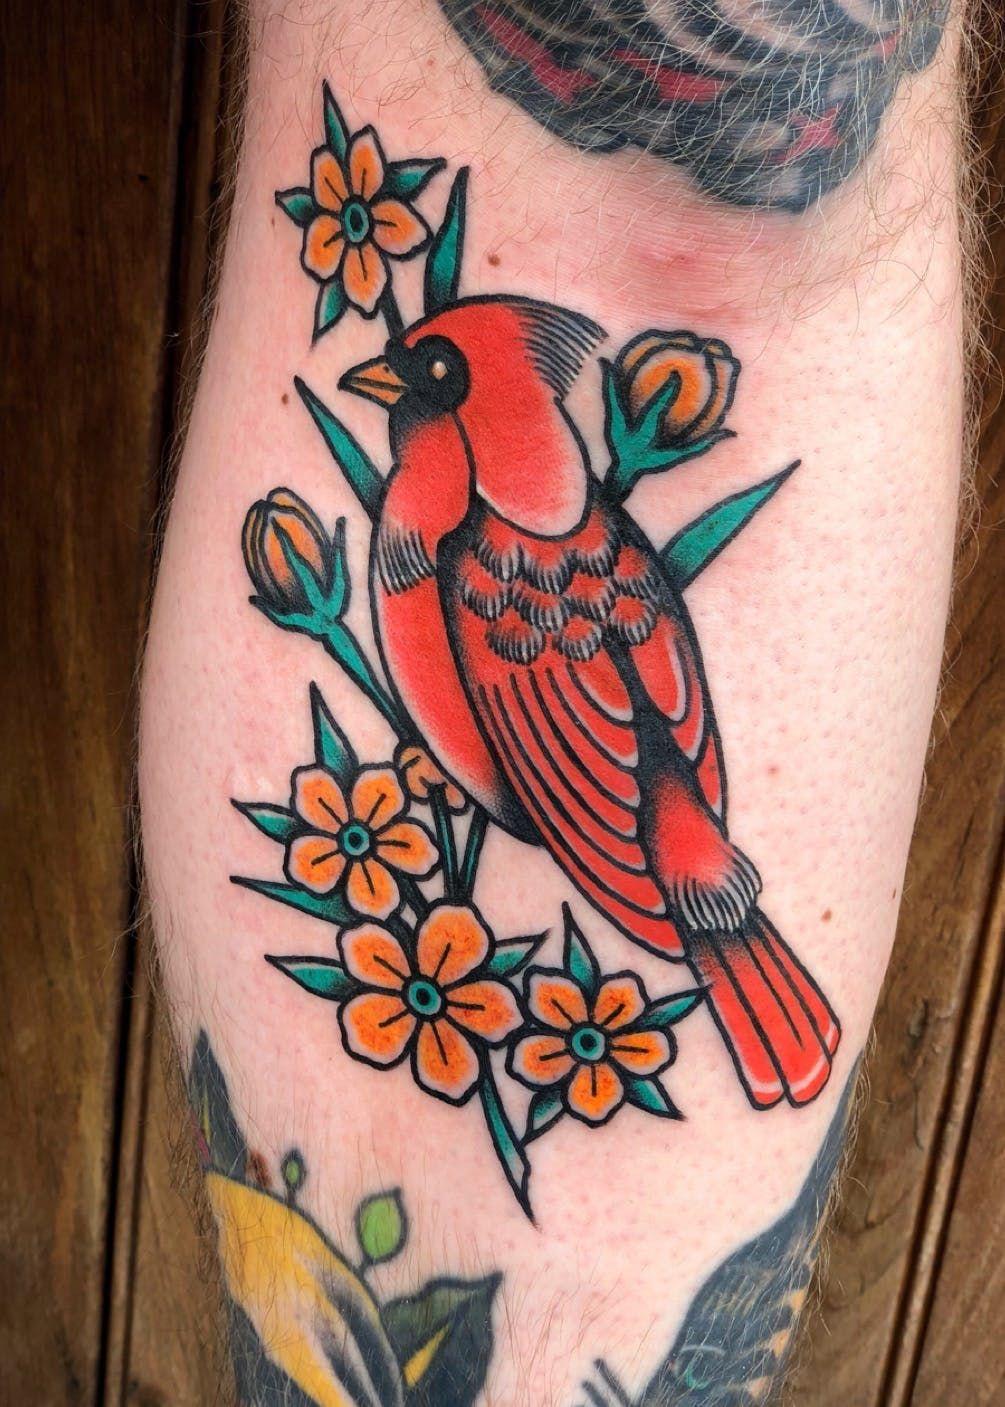 Perched Cardinal Cardinaltattoo Birdtattoo Neotraditional Traditional Traditional Tattoo Flowers Traditional Tattoo Animals Traditional Tattoo Bird